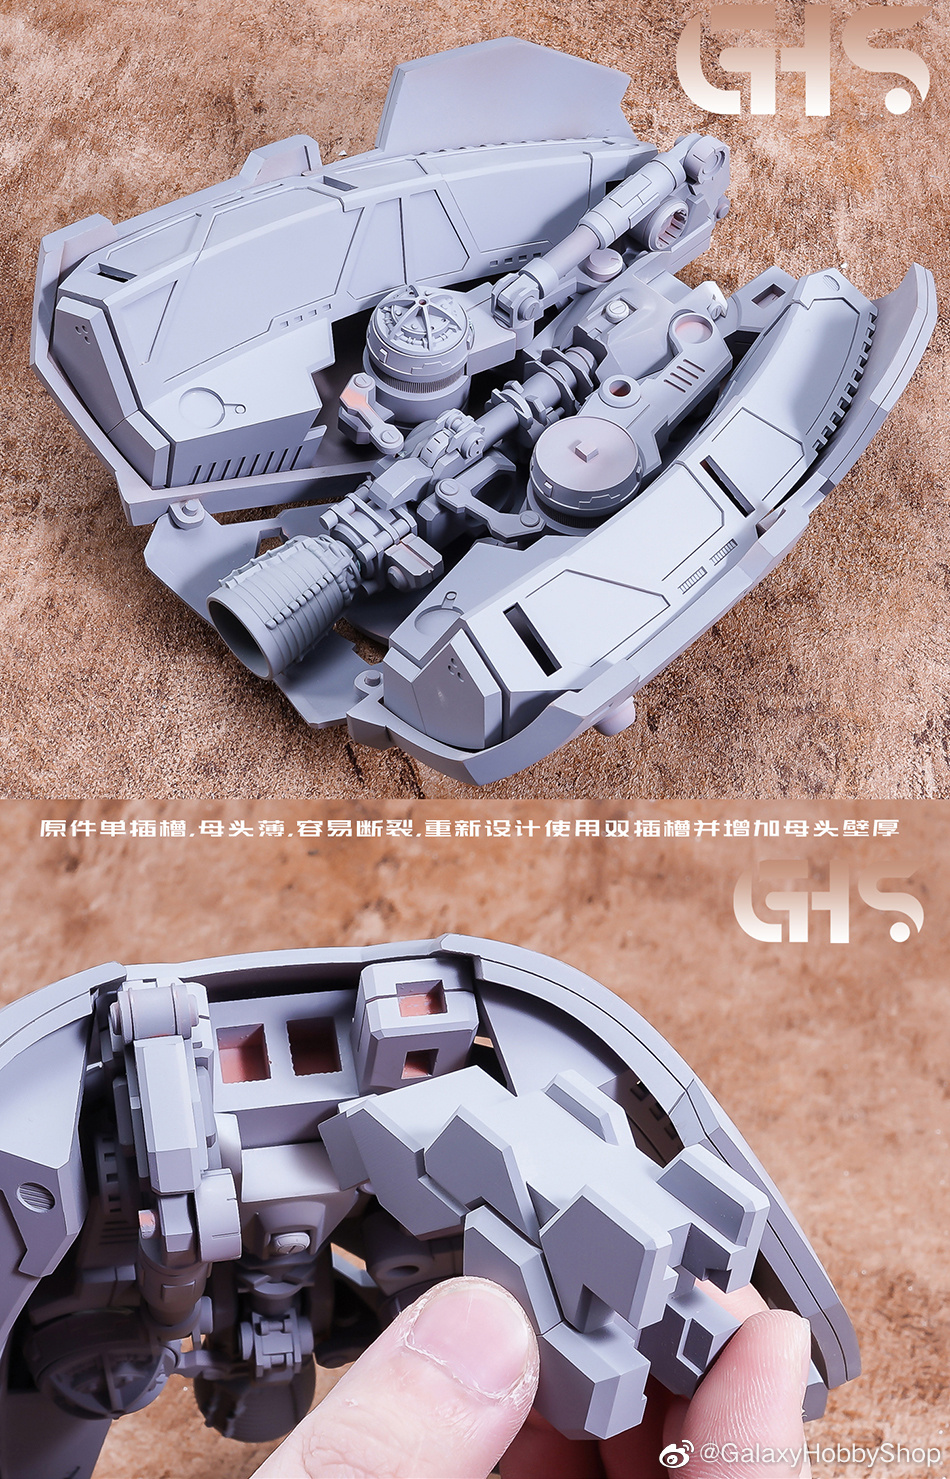 G871_GS_GSH_the_o_GK_004.jpg